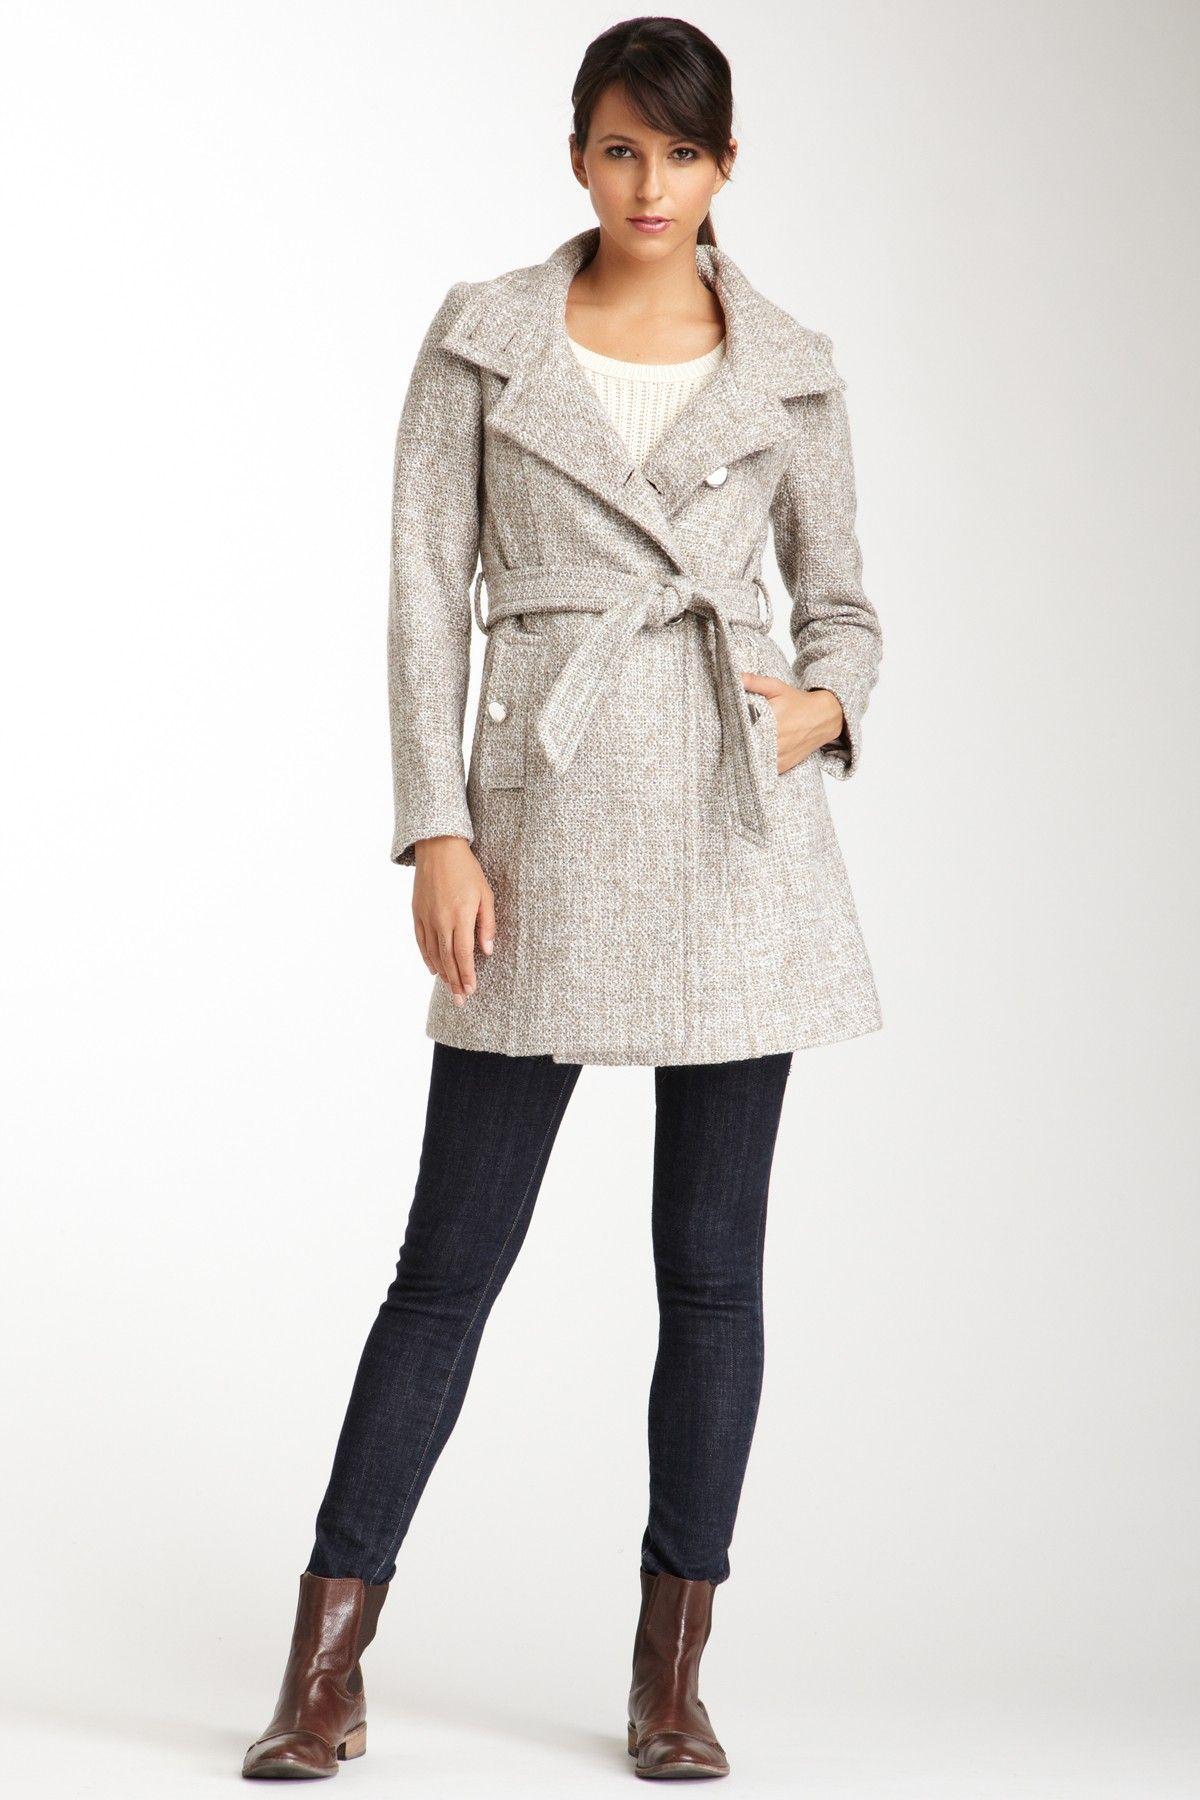 Tahari Izzy Wool Coat.. Looks so cozy and sophisticated